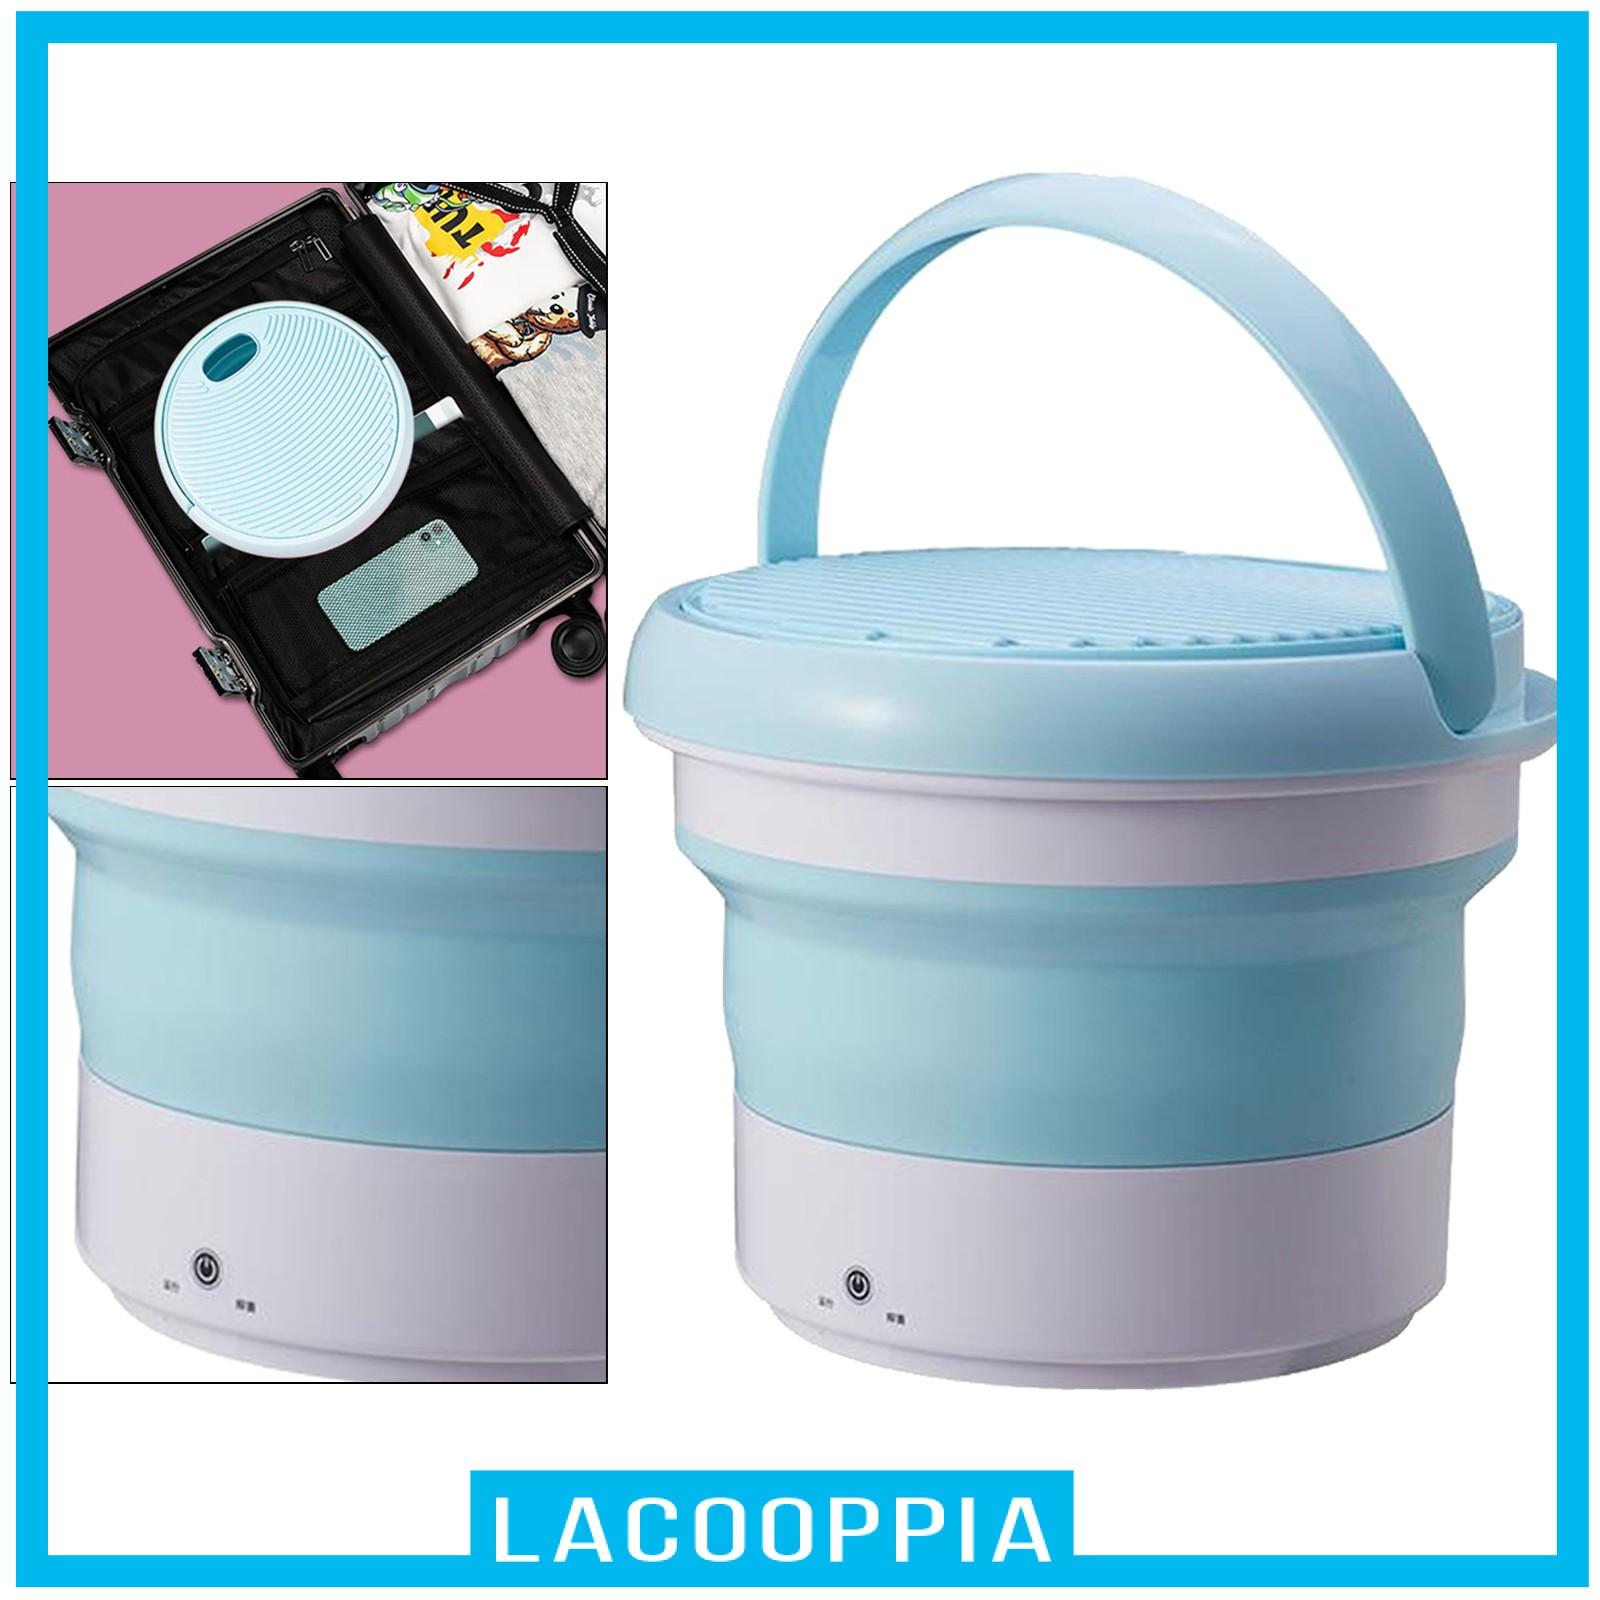 [Lacooppia] 洗衣機桶臭氧殺菌觸摸控制洗滌